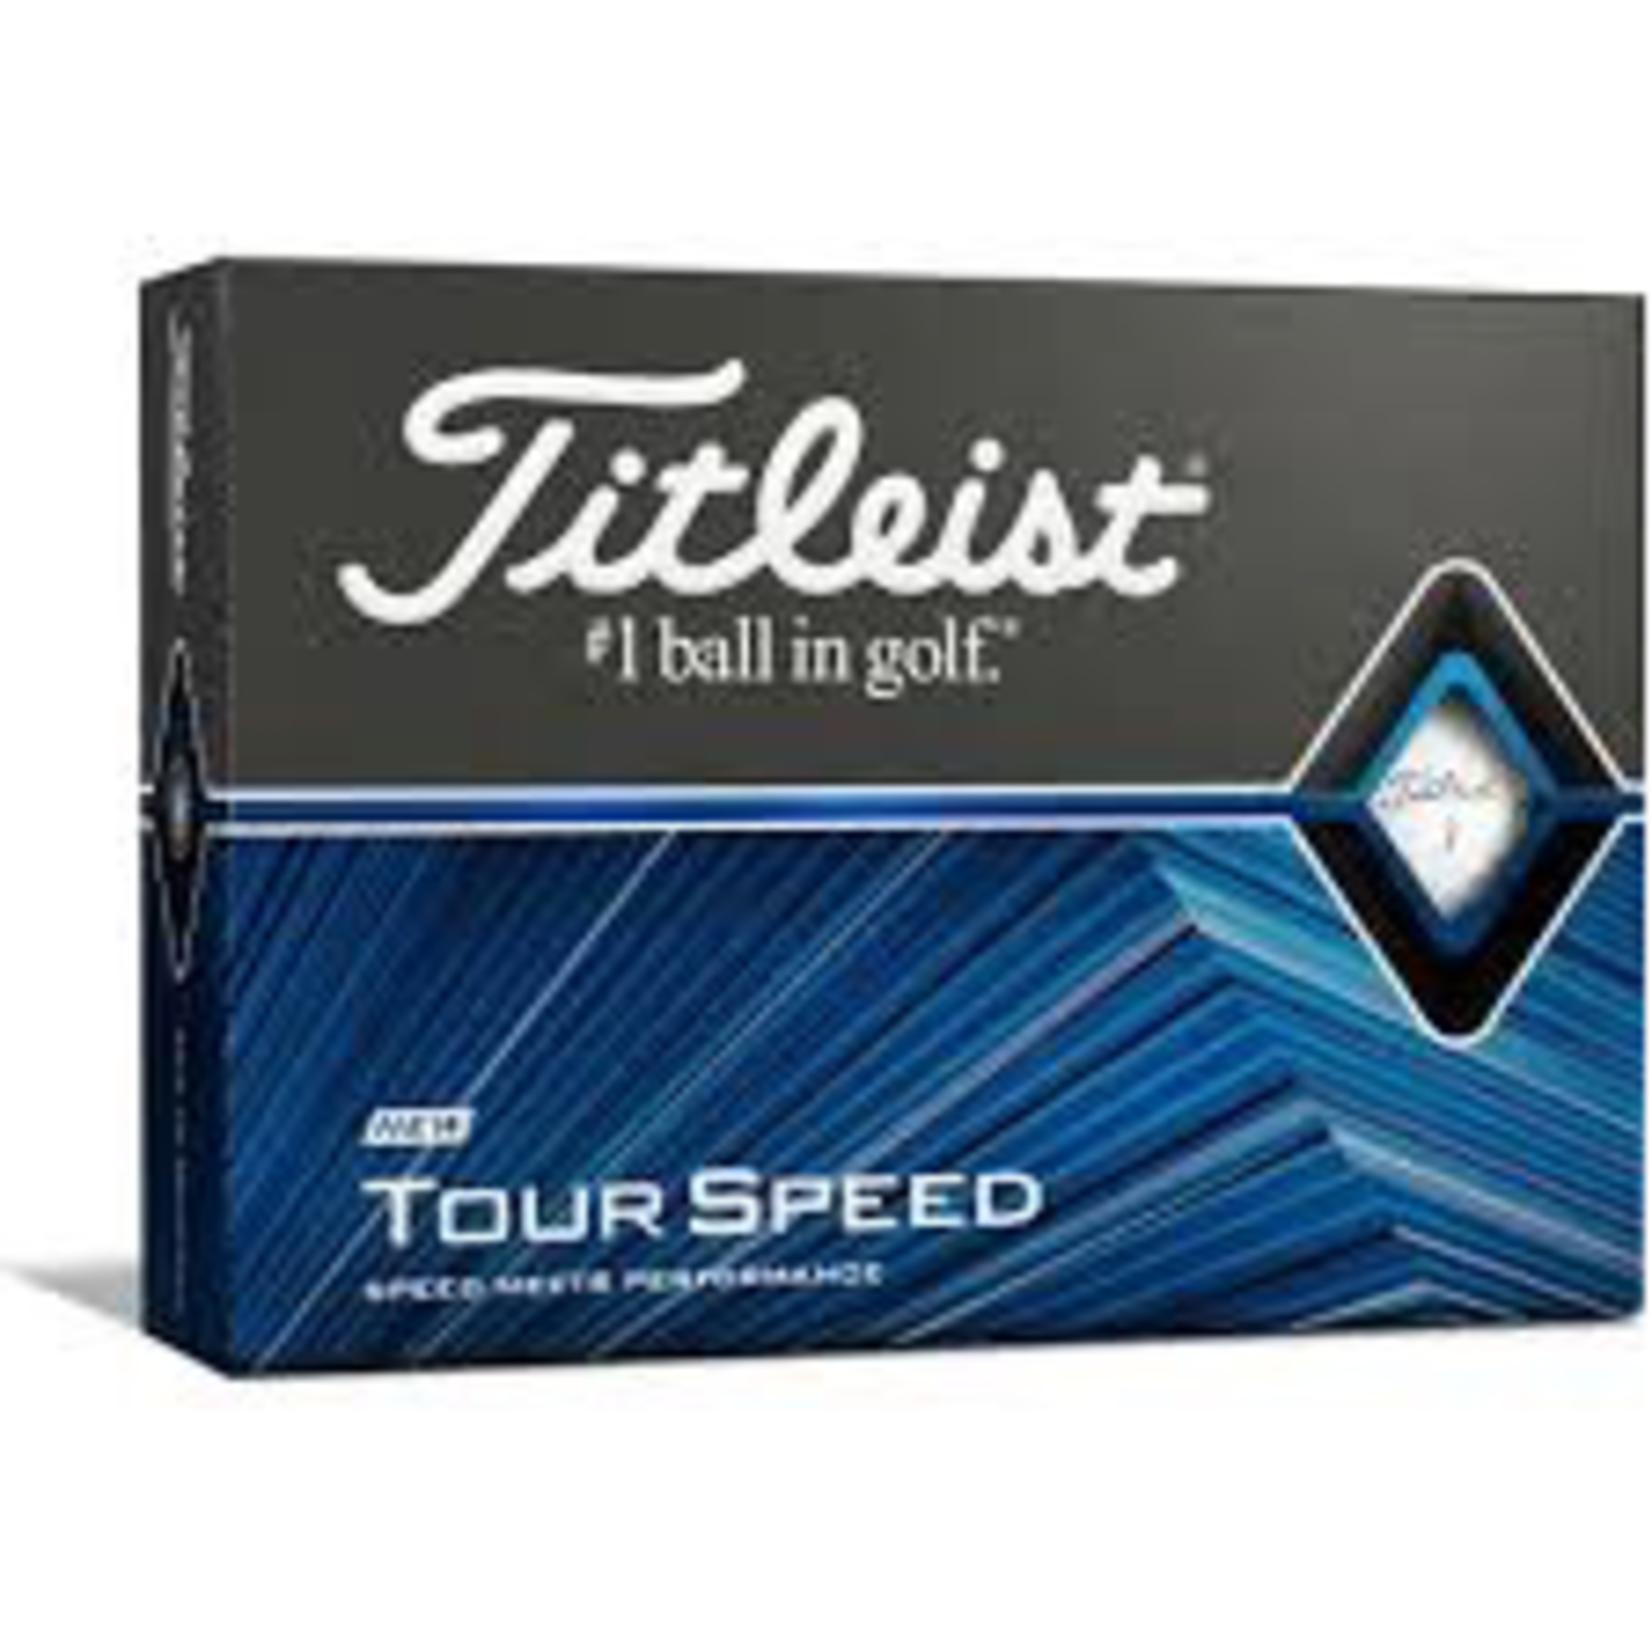 TITLEIST TITLEIST TOUR SPEED BALLS DOZEN